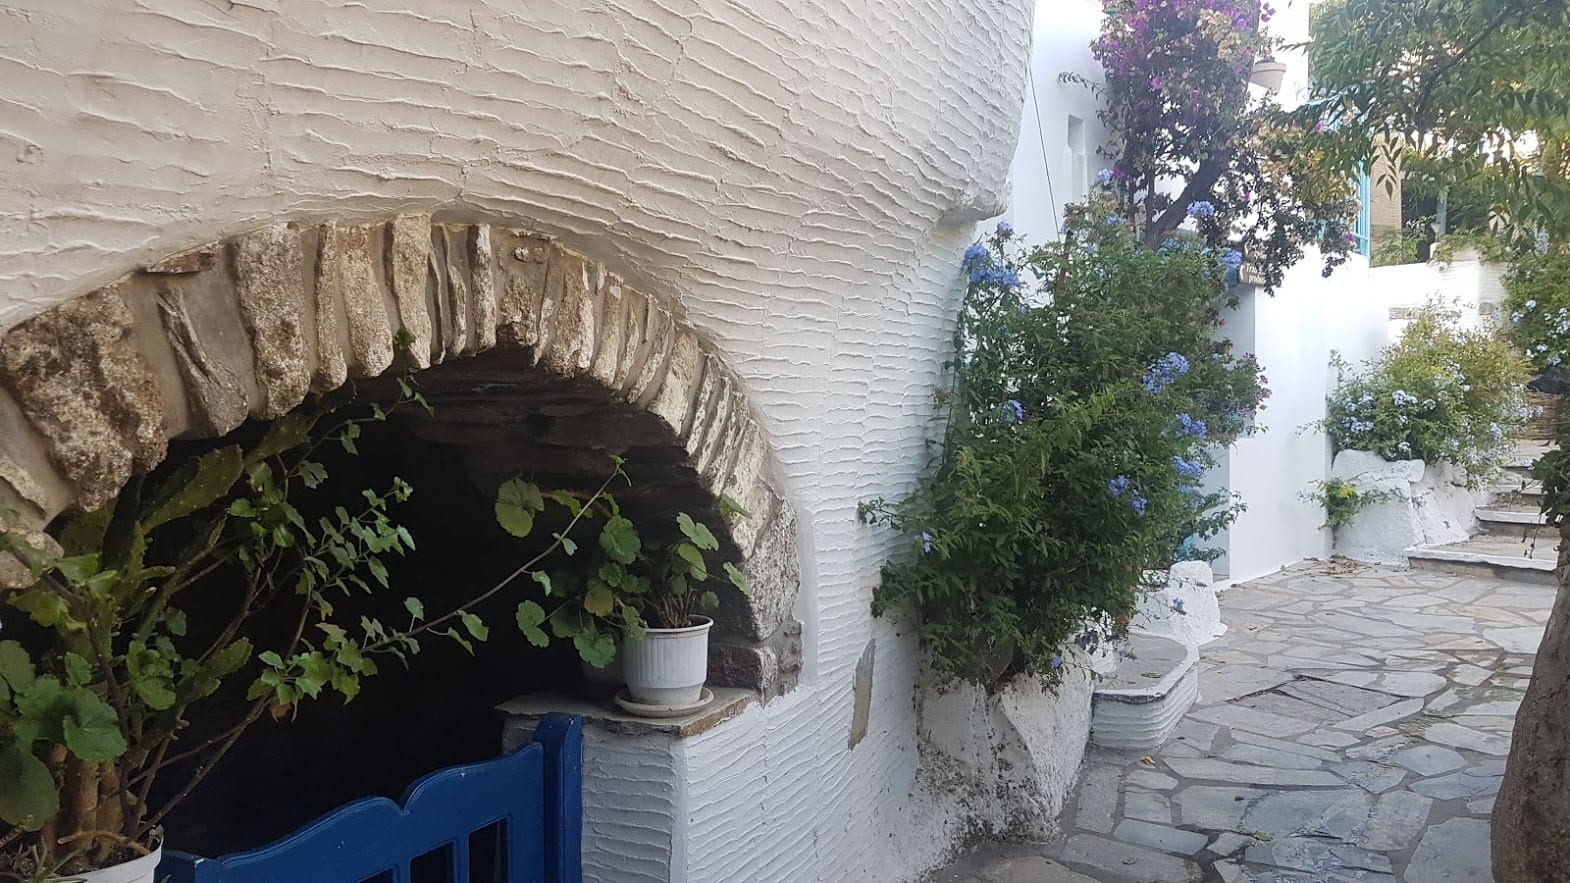 Exploring Tinos Island in Greece